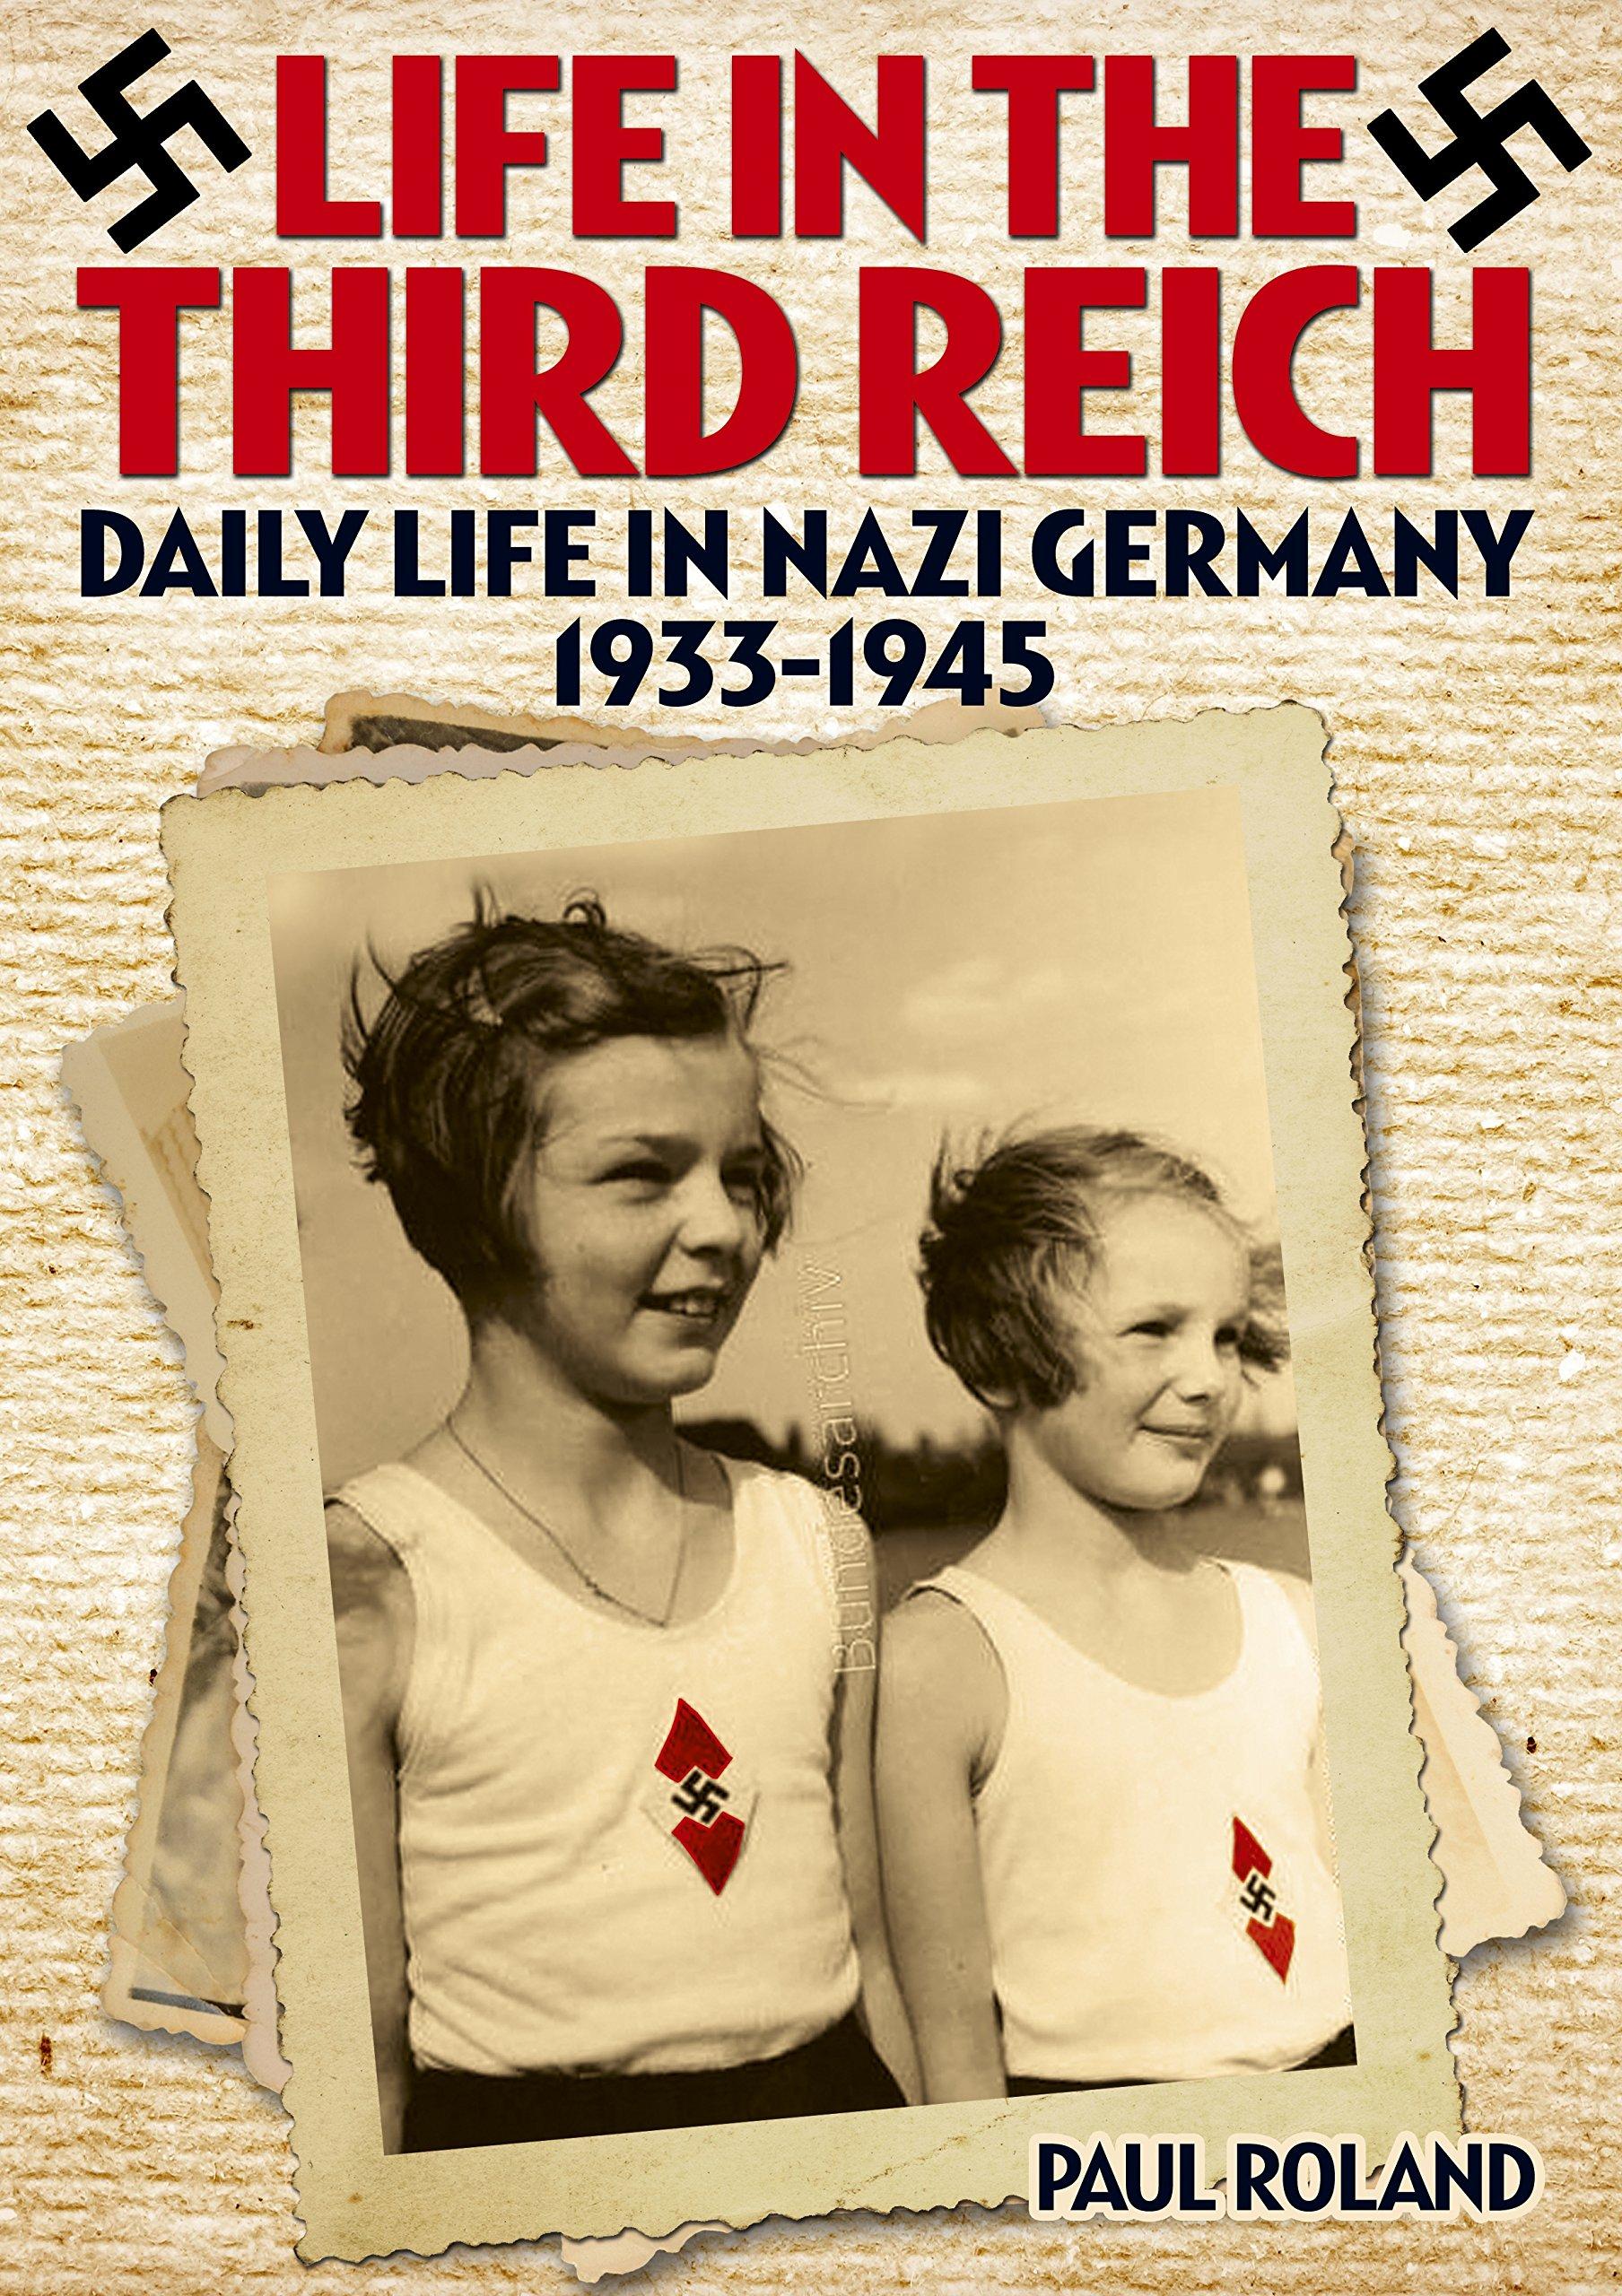 Third Reich Ideal Nazy Girls Picture.